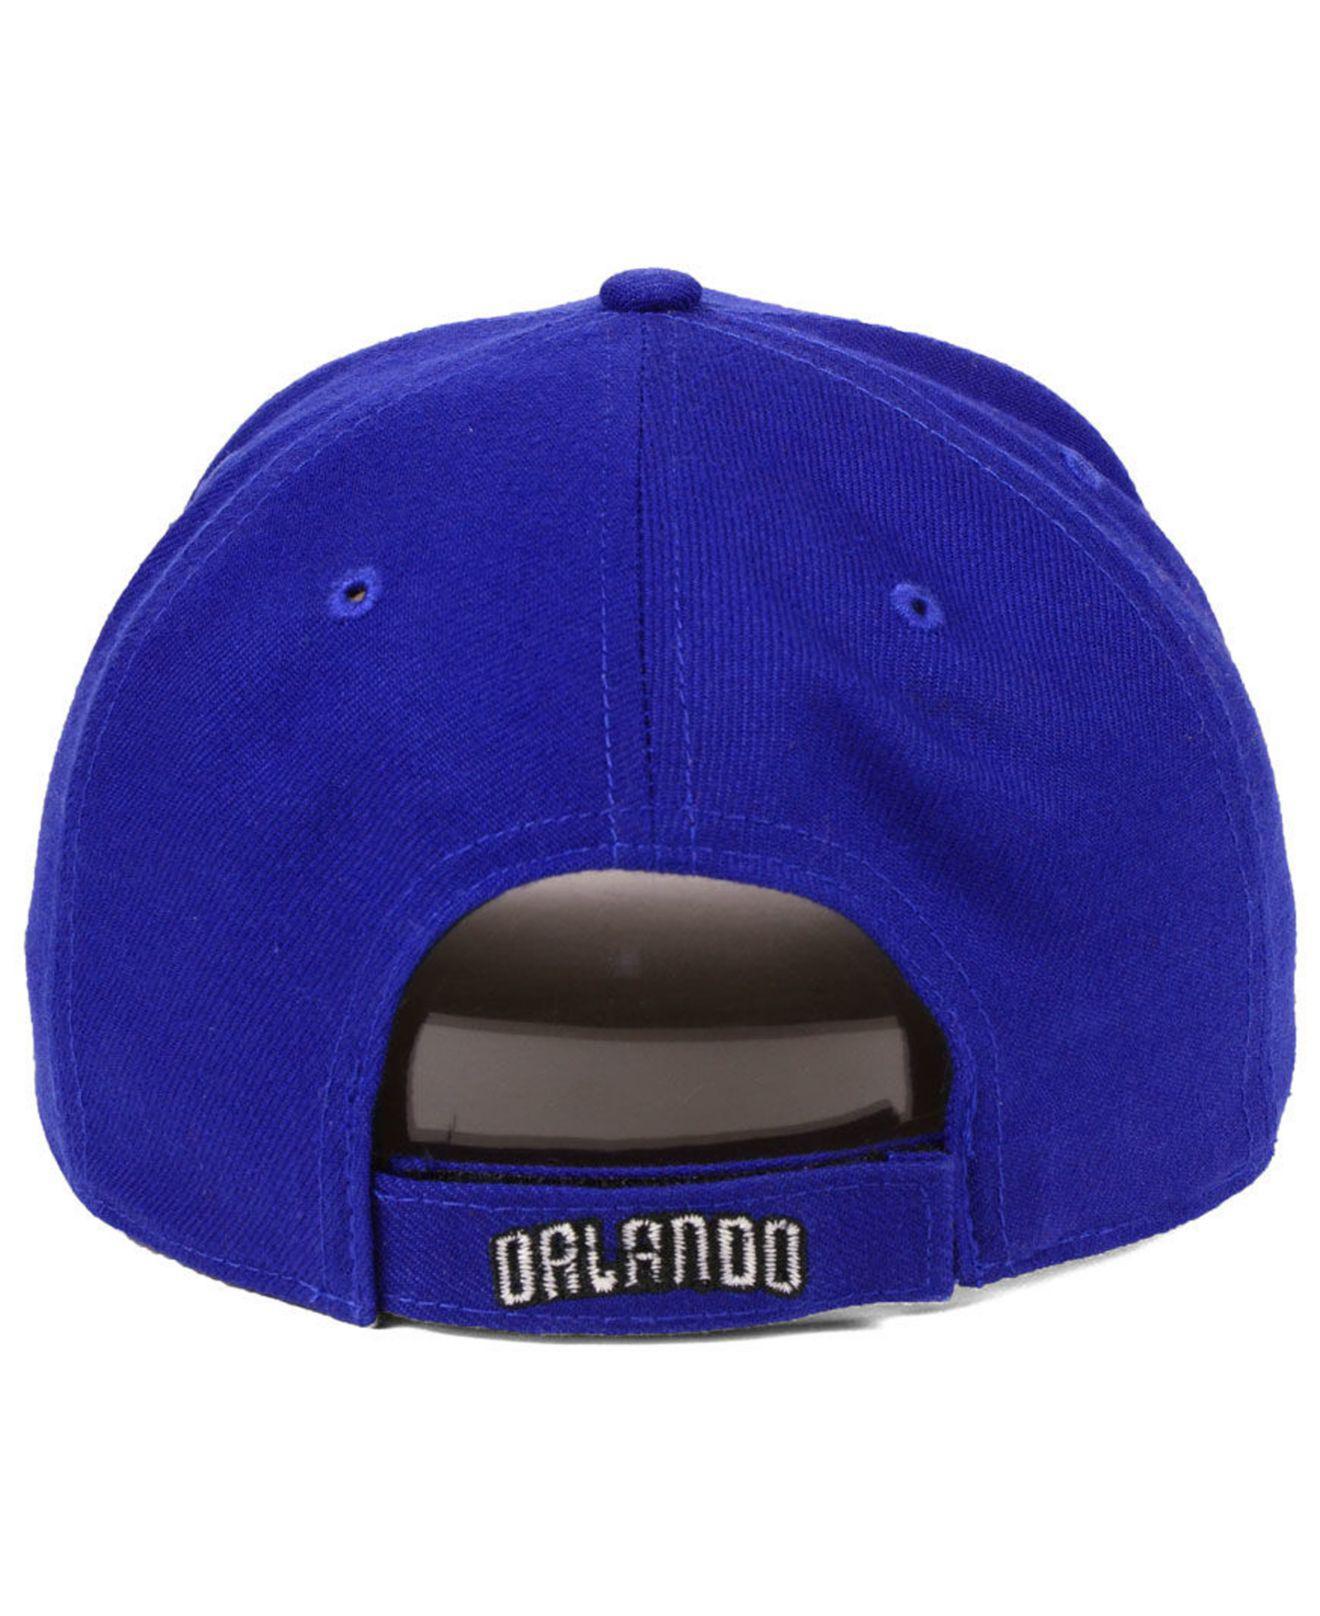 the best attitude 781cc e6134 ... cheap sale 47 brand blue orlando magic mash up mvp cap for men lyst.  view